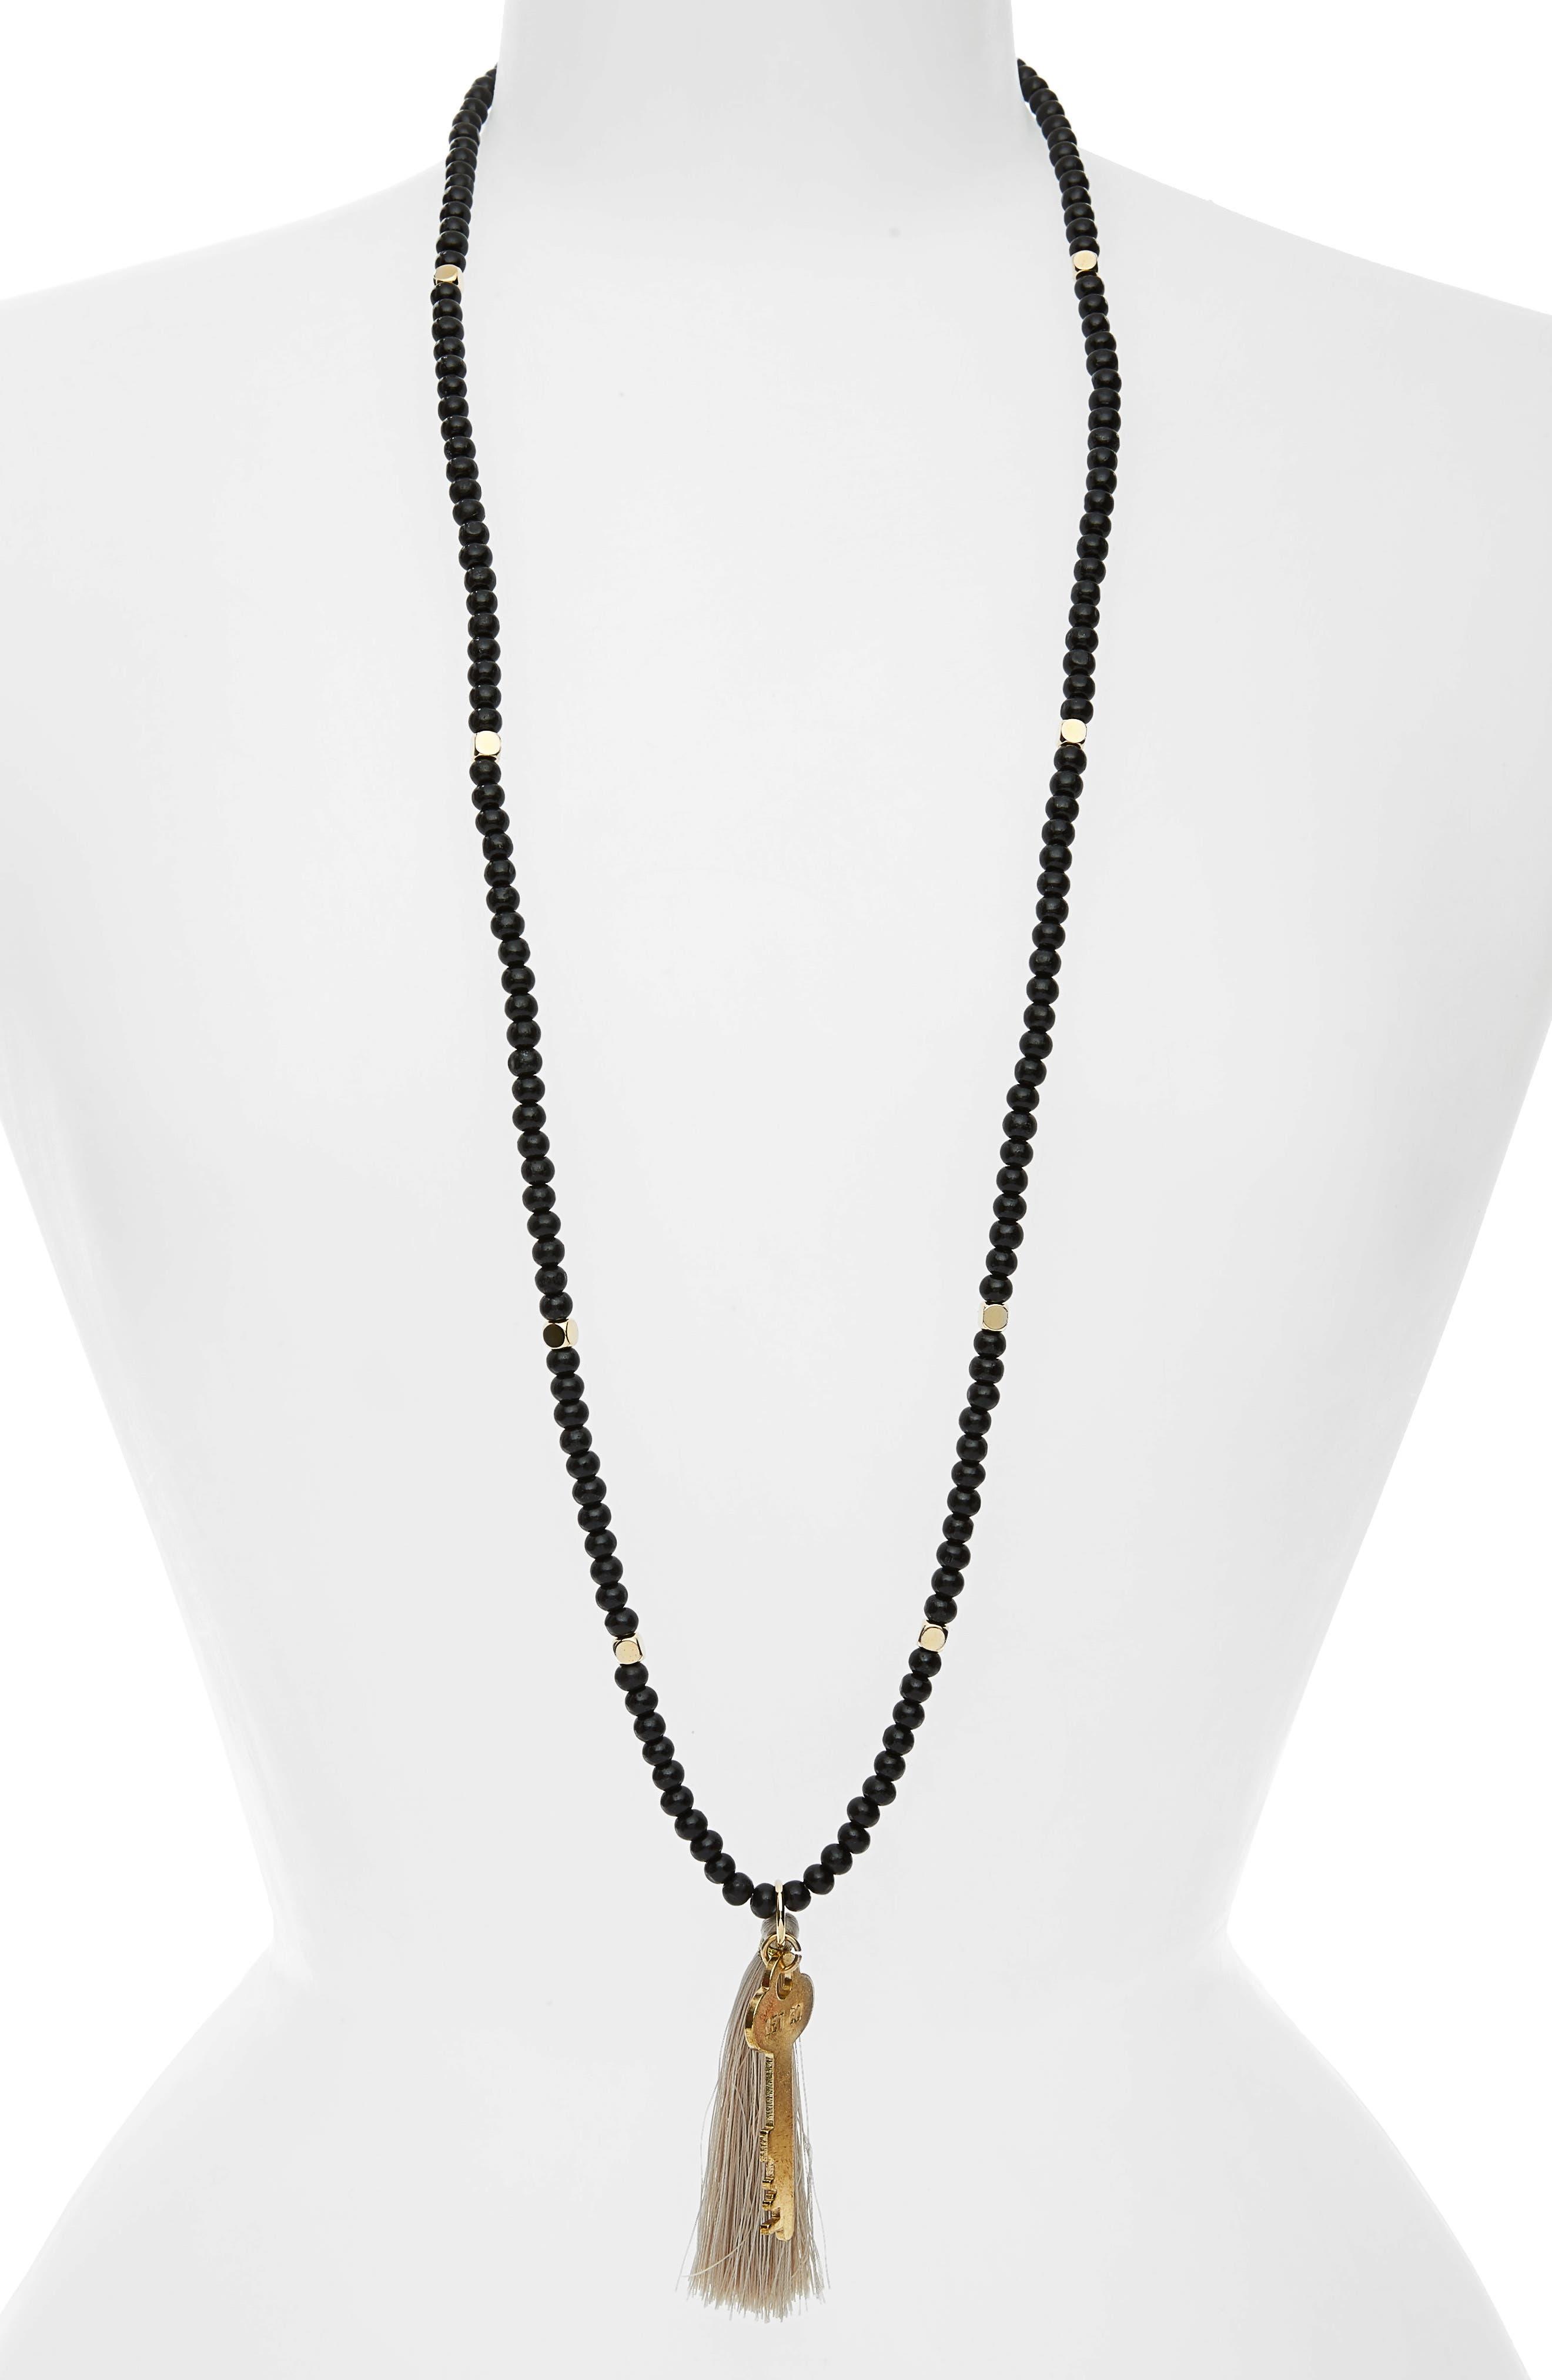 Inspiration Key Charm & Tassel Beaded Necklace,                             Main thumbnail 1, color,                             Ebony/ Gold- Let Go